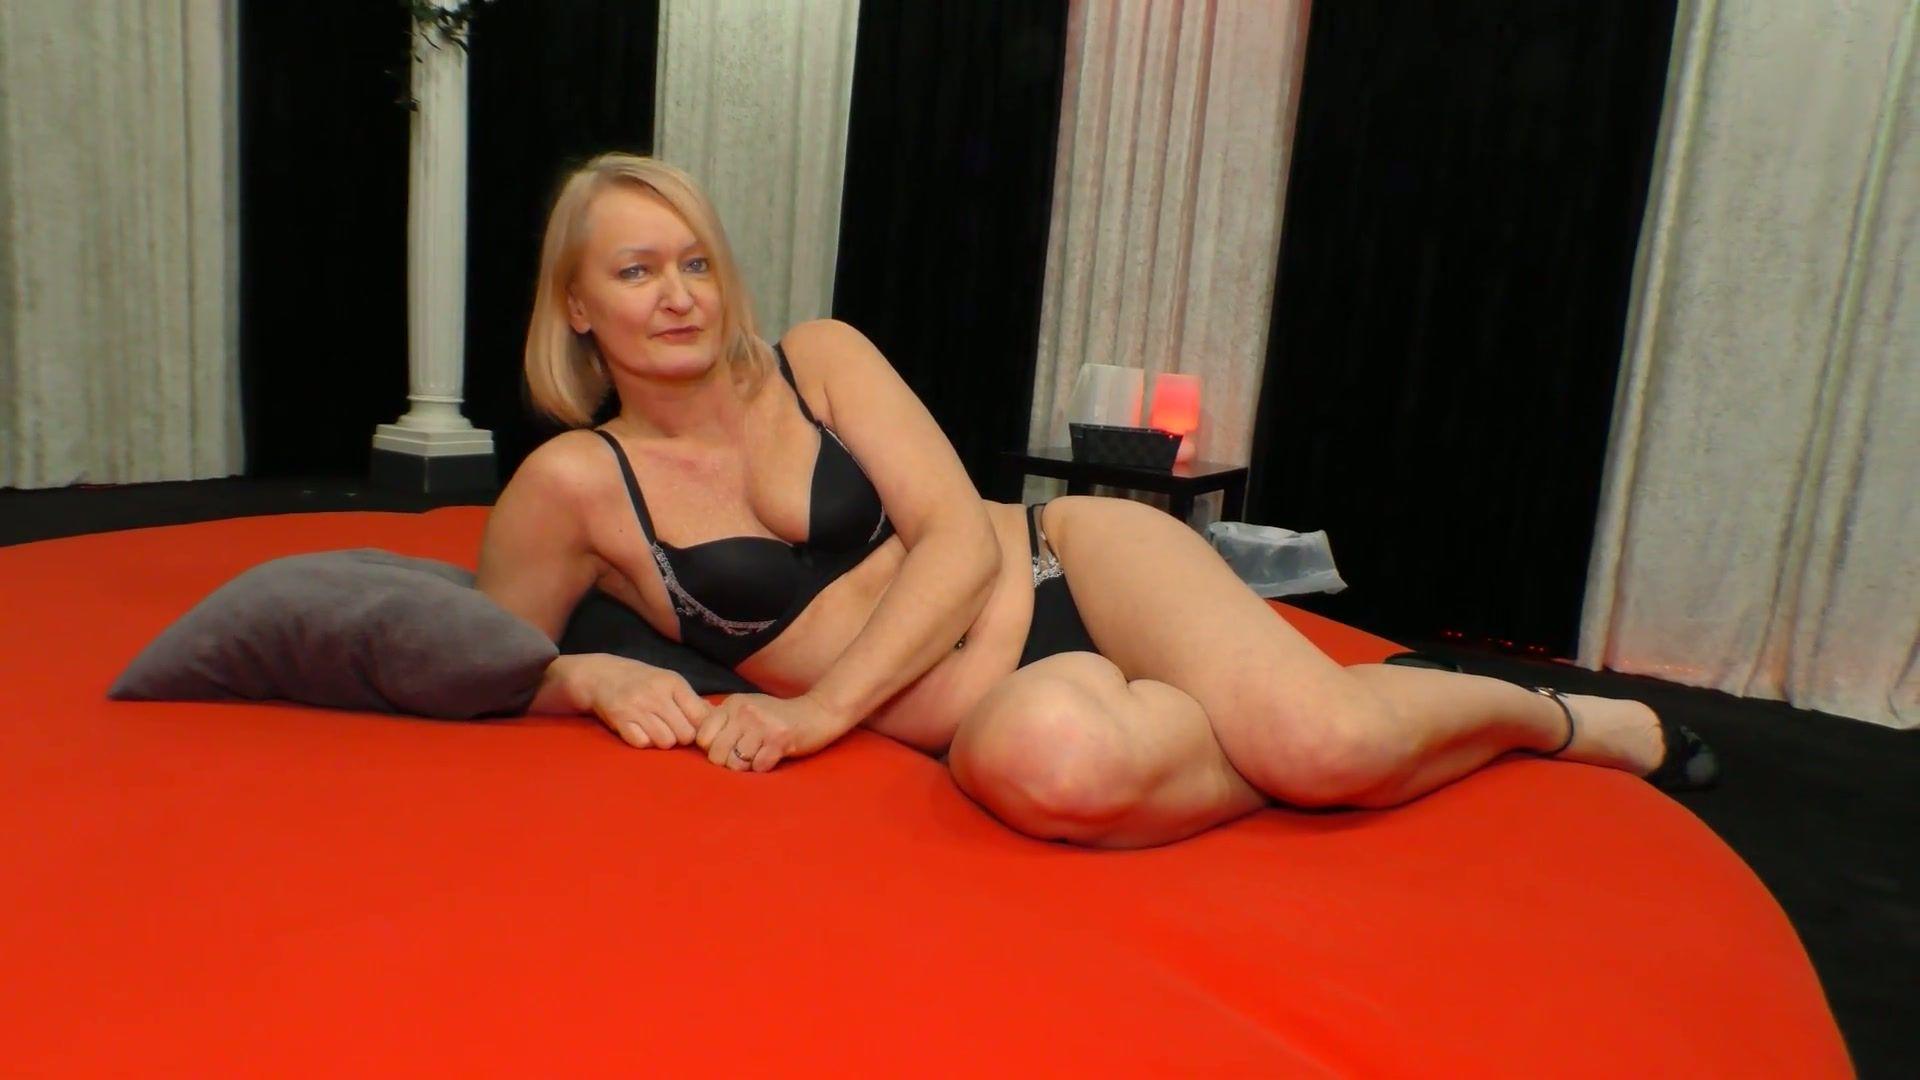 Charlotte mckenzie nude